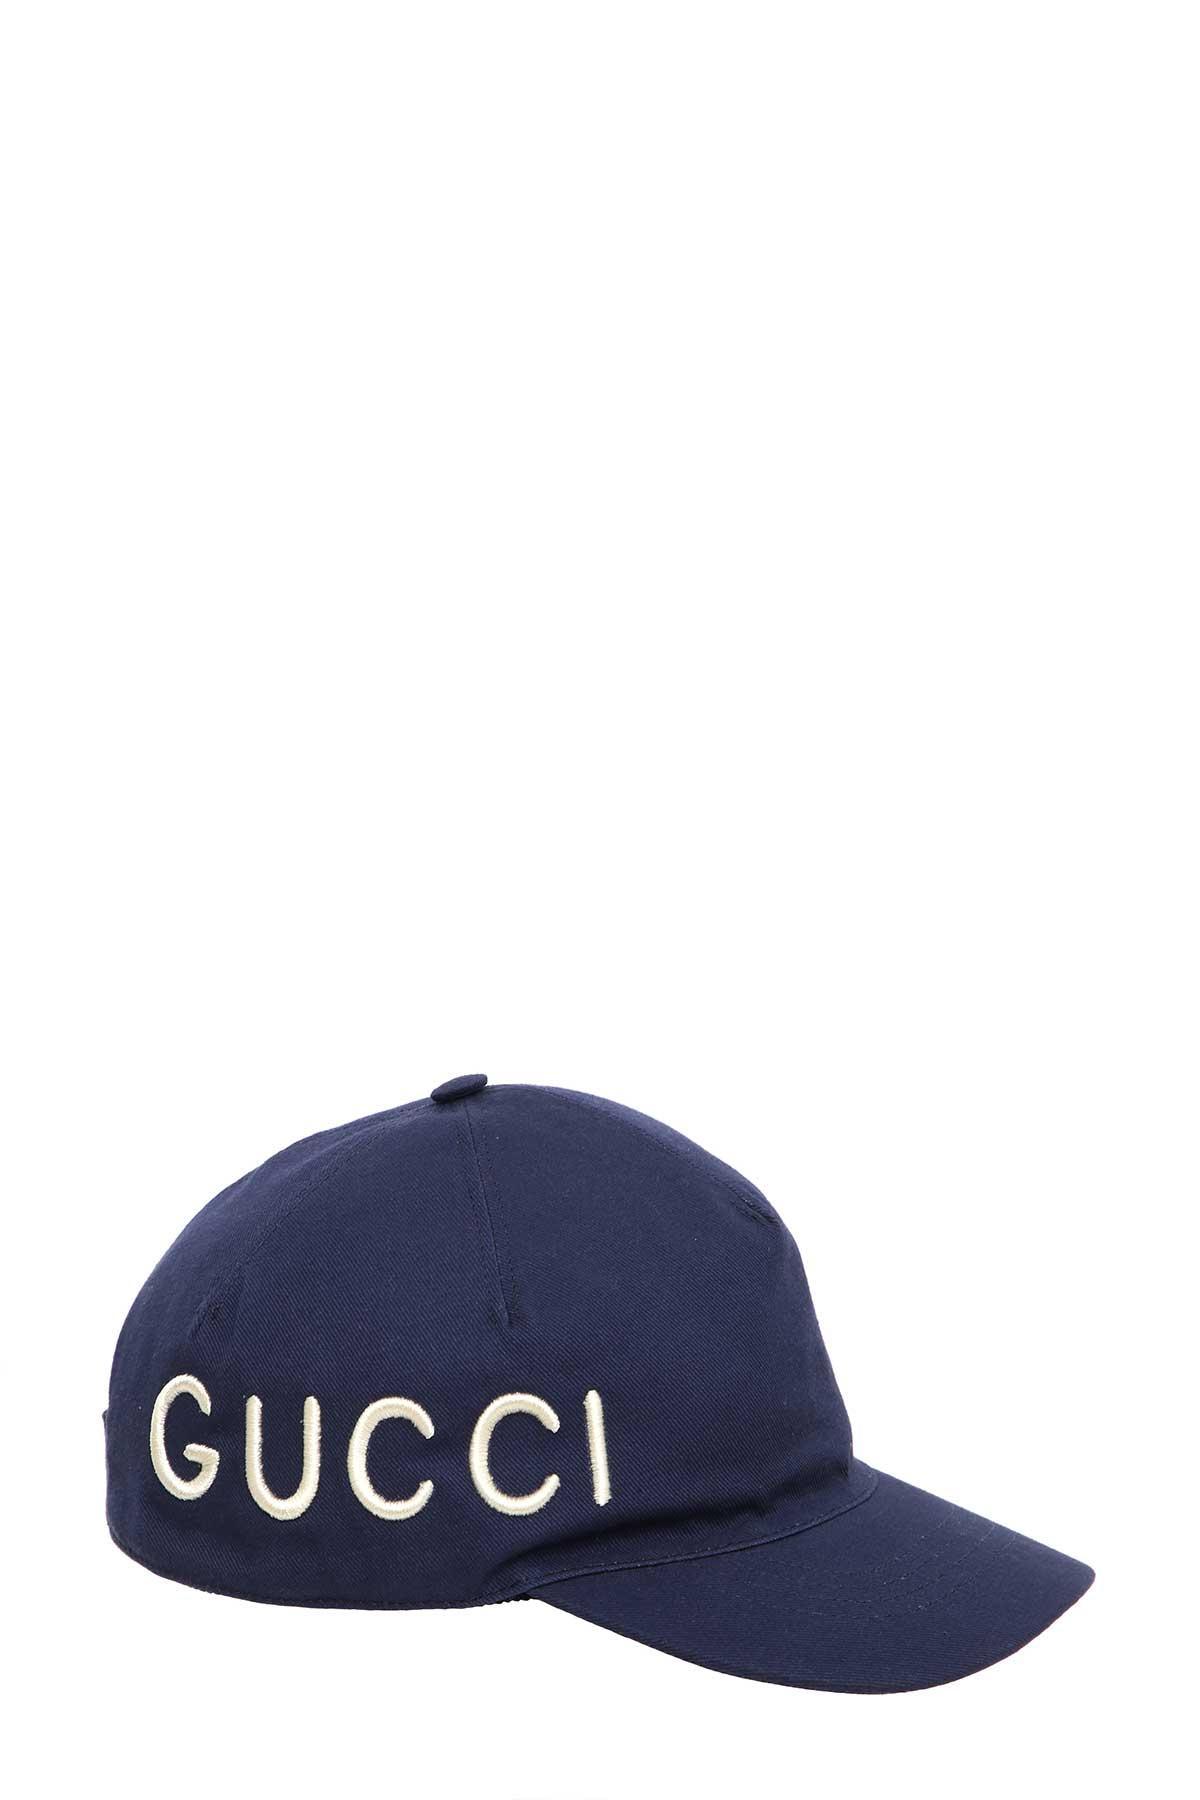 fddd47477d8 Gucci Baseball Cap In Navy